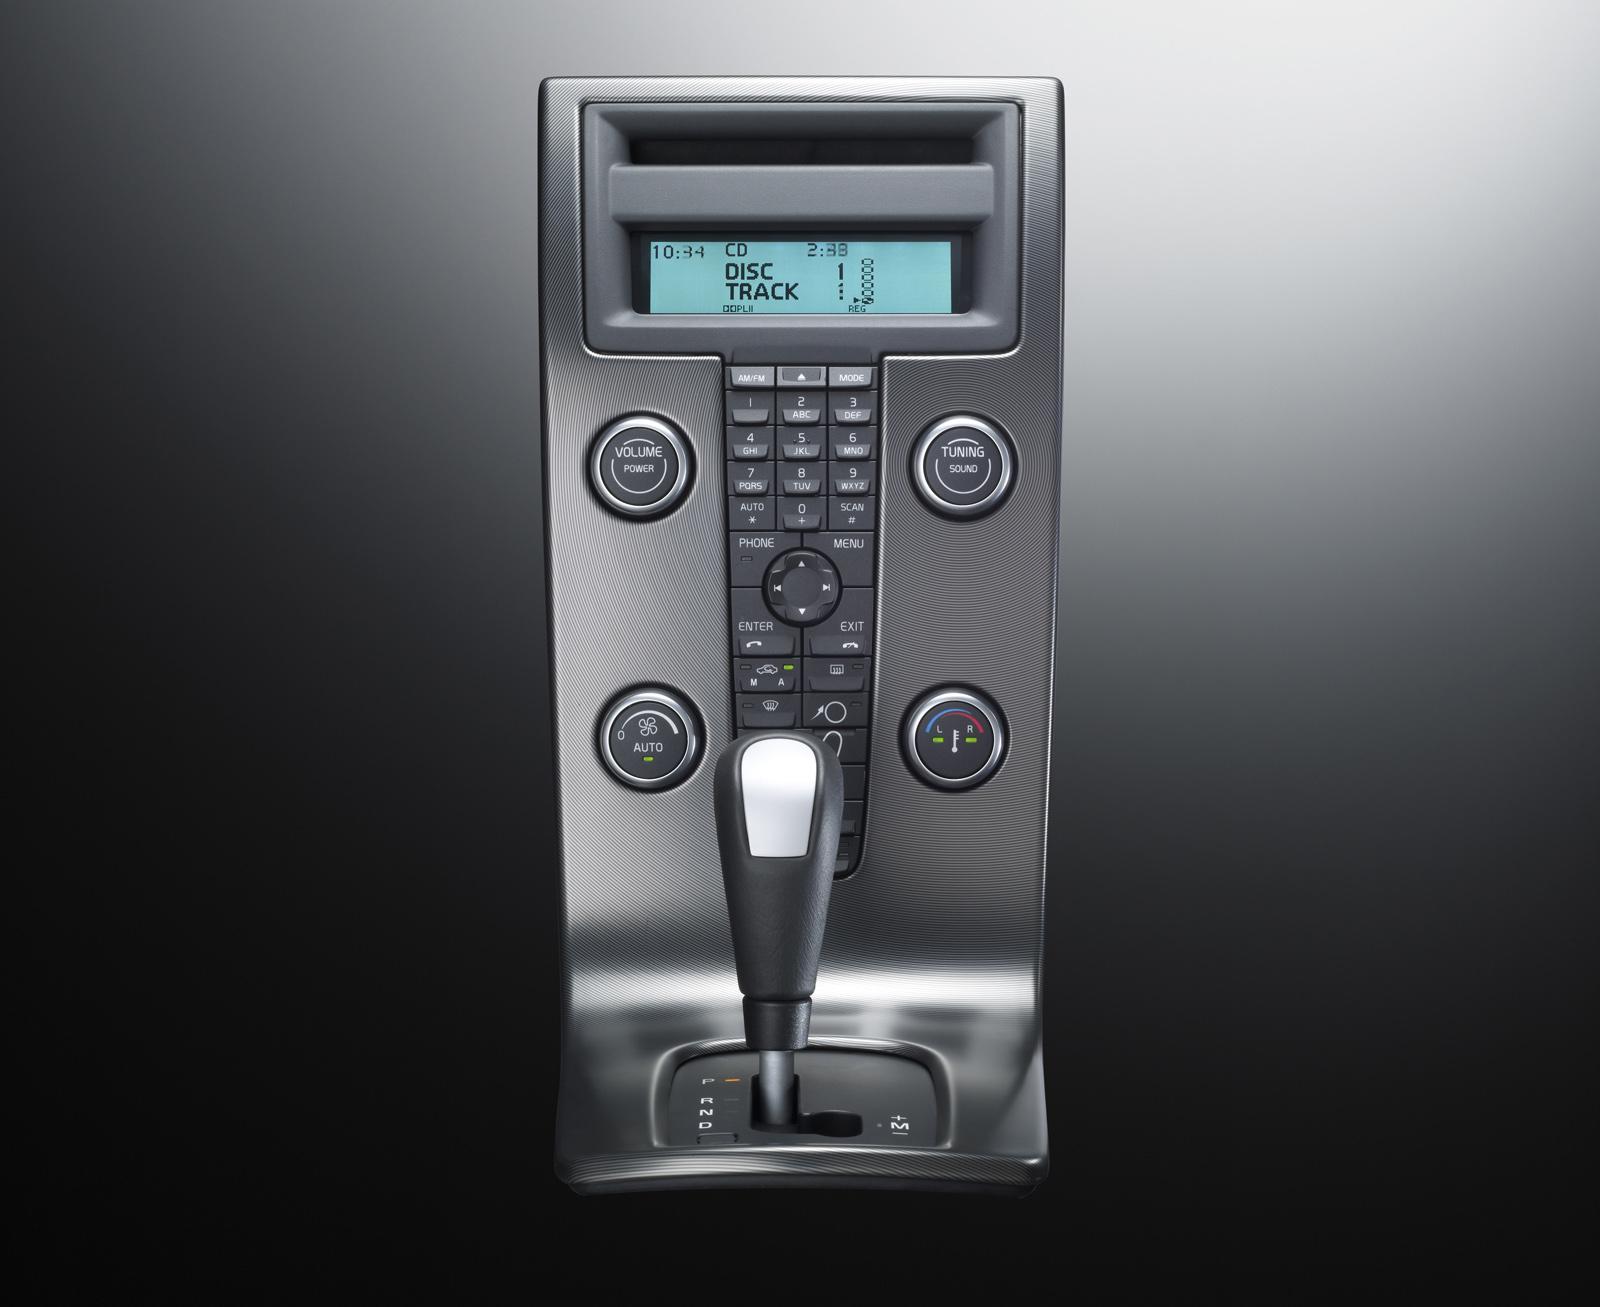 Volvo C30 Interior Design Award - Picture 34455